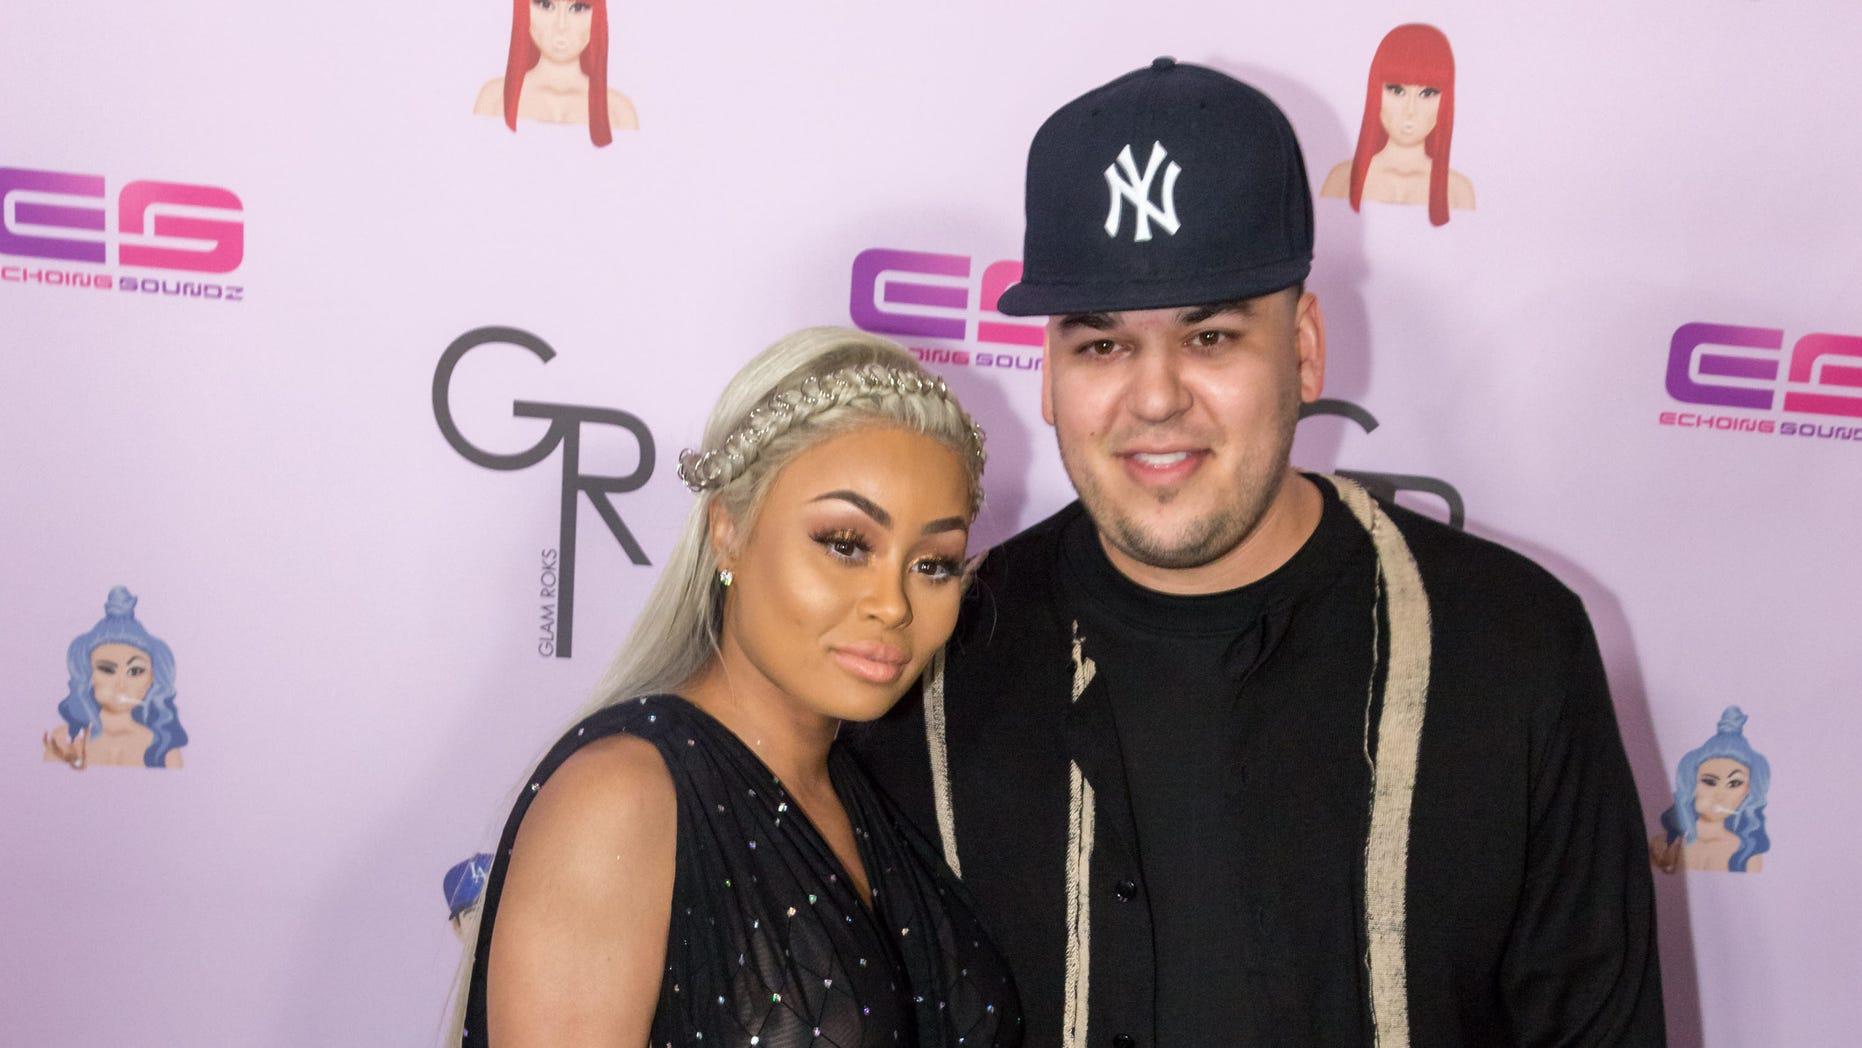 Blac Chyna allegedly got into a heated altercation with her ex, Rob Kardashian's new girlfriend.